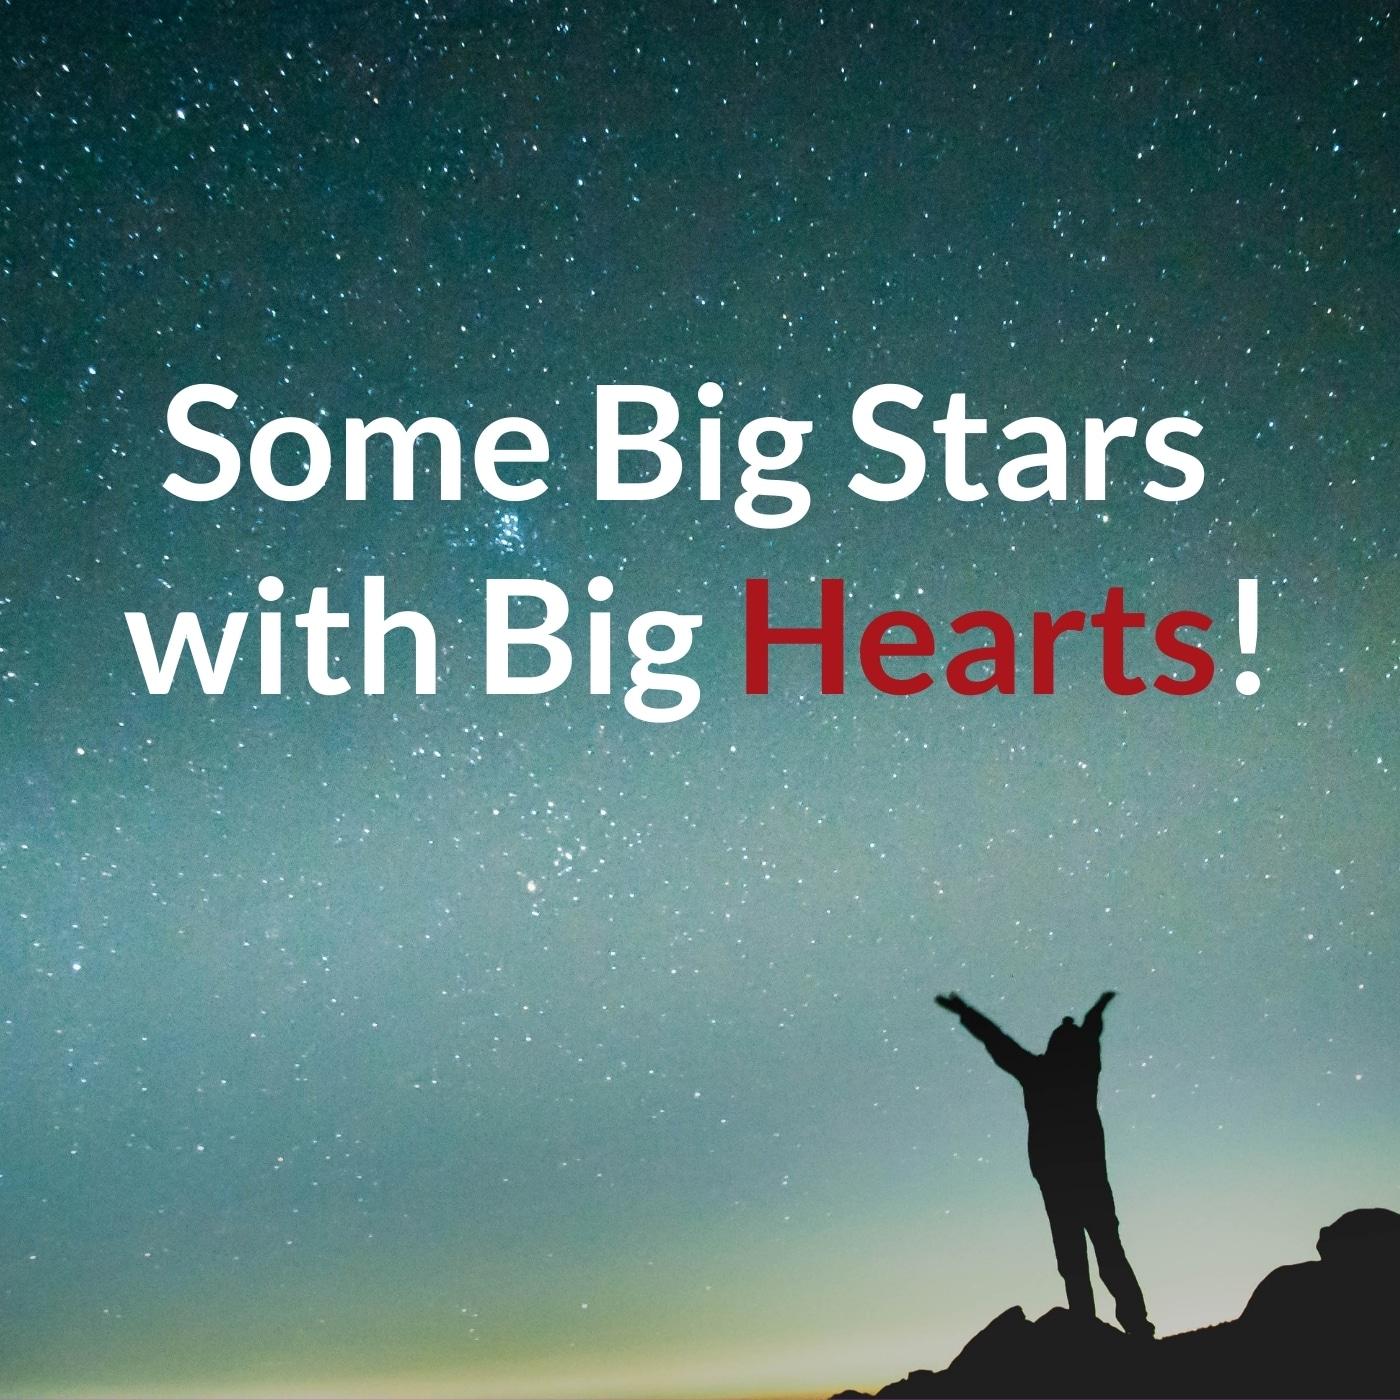 Some Big Stars with Big Hearts!